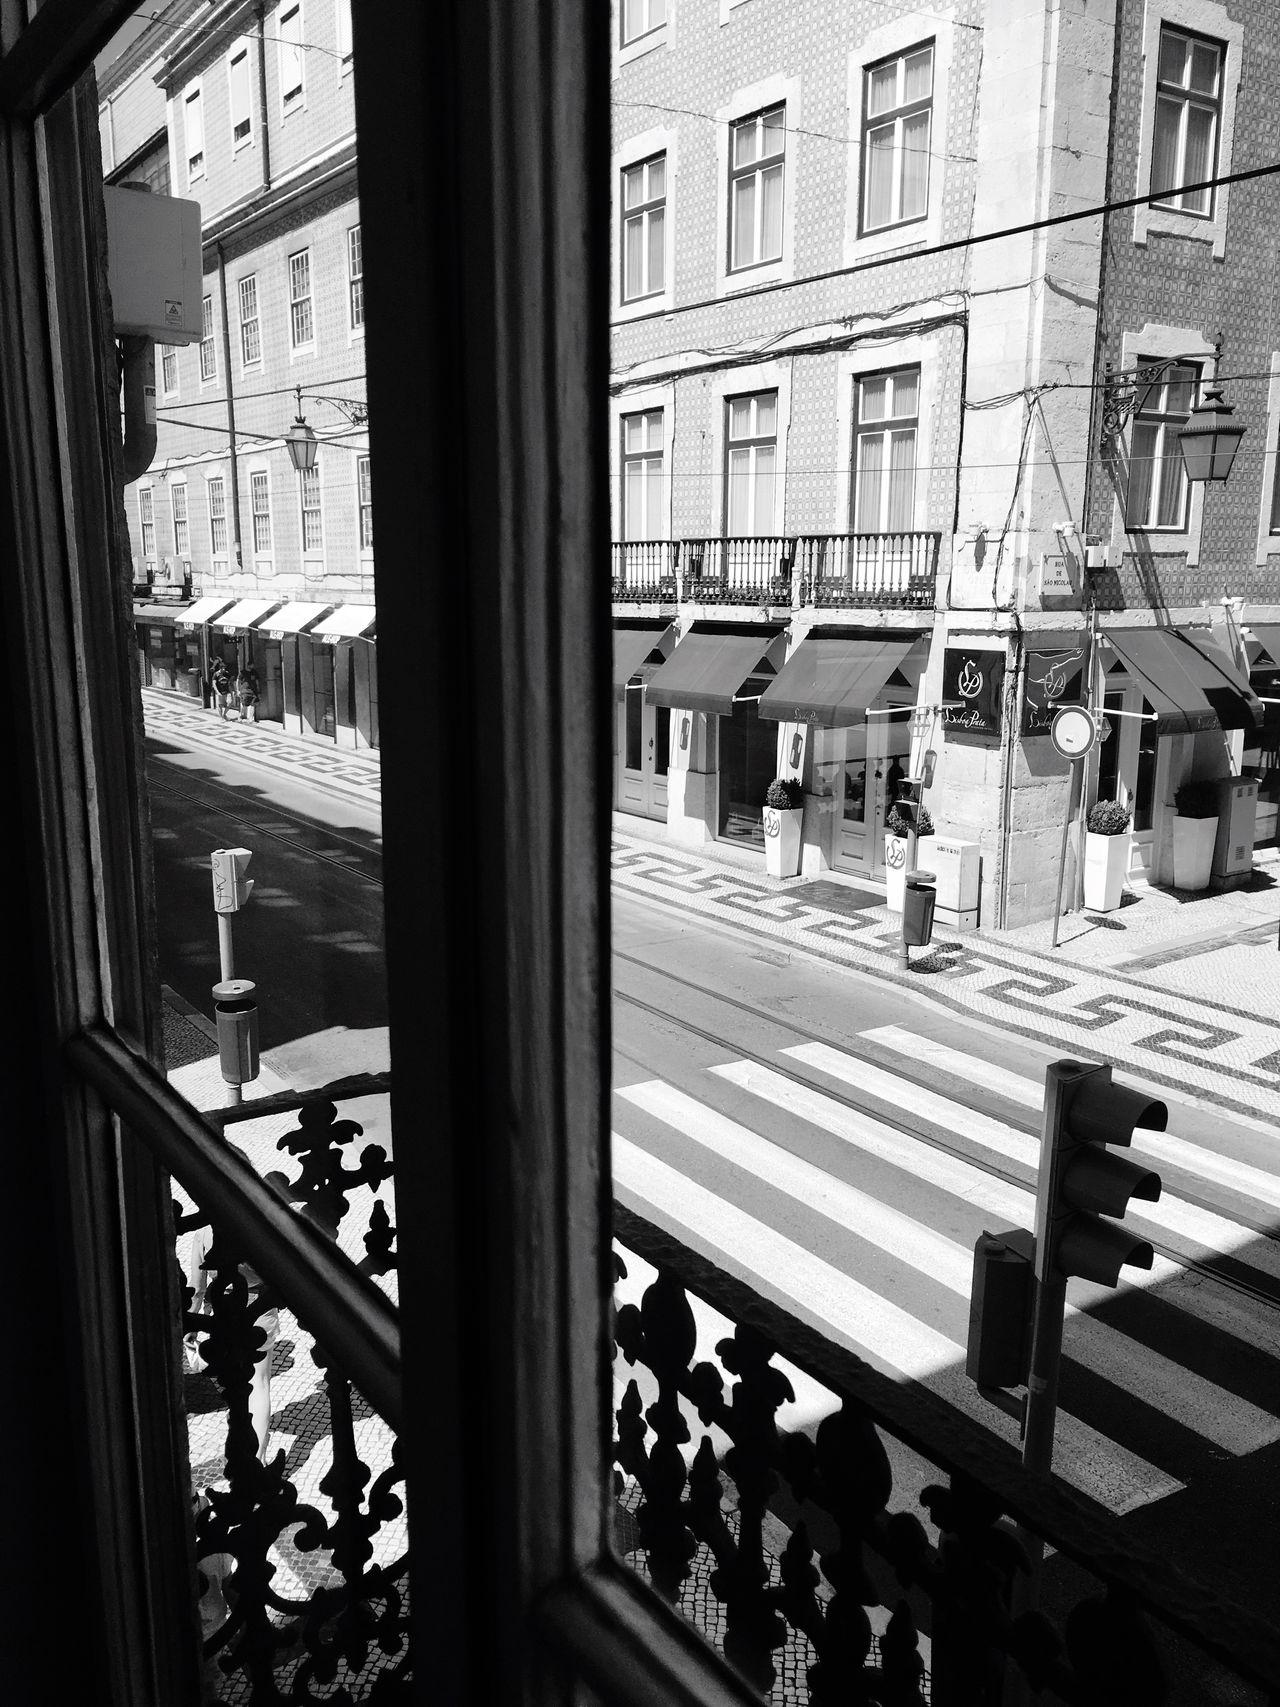 Através da vidraça Calçada Portuguesa Portuguese Architecture Lisbonlovers LisbonLight Urbanphotography Urban Photography Natural Light Black & White Traffic Lights Old Town Crosswalk Urban Geometry Afternoon Sun Capital City Old Buildings Not Forgotten Blackandwhite Photography Arquitecture Lisbon Lounge Hostel Get To Know Your Country Travel Like A Tourist